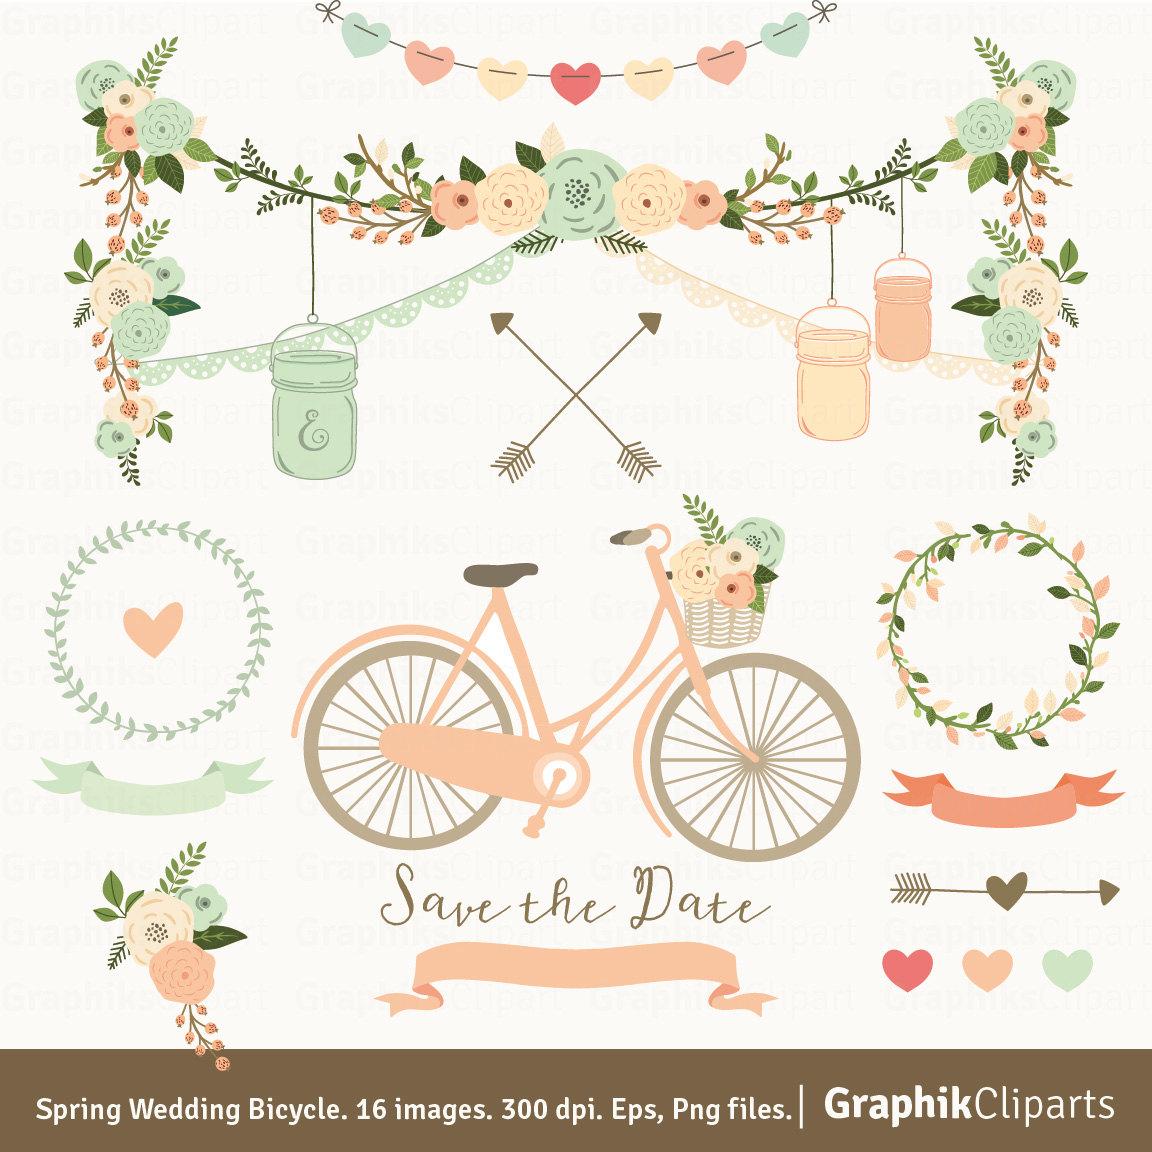 Bike clipart rustic. Spring wedding bicycle floral